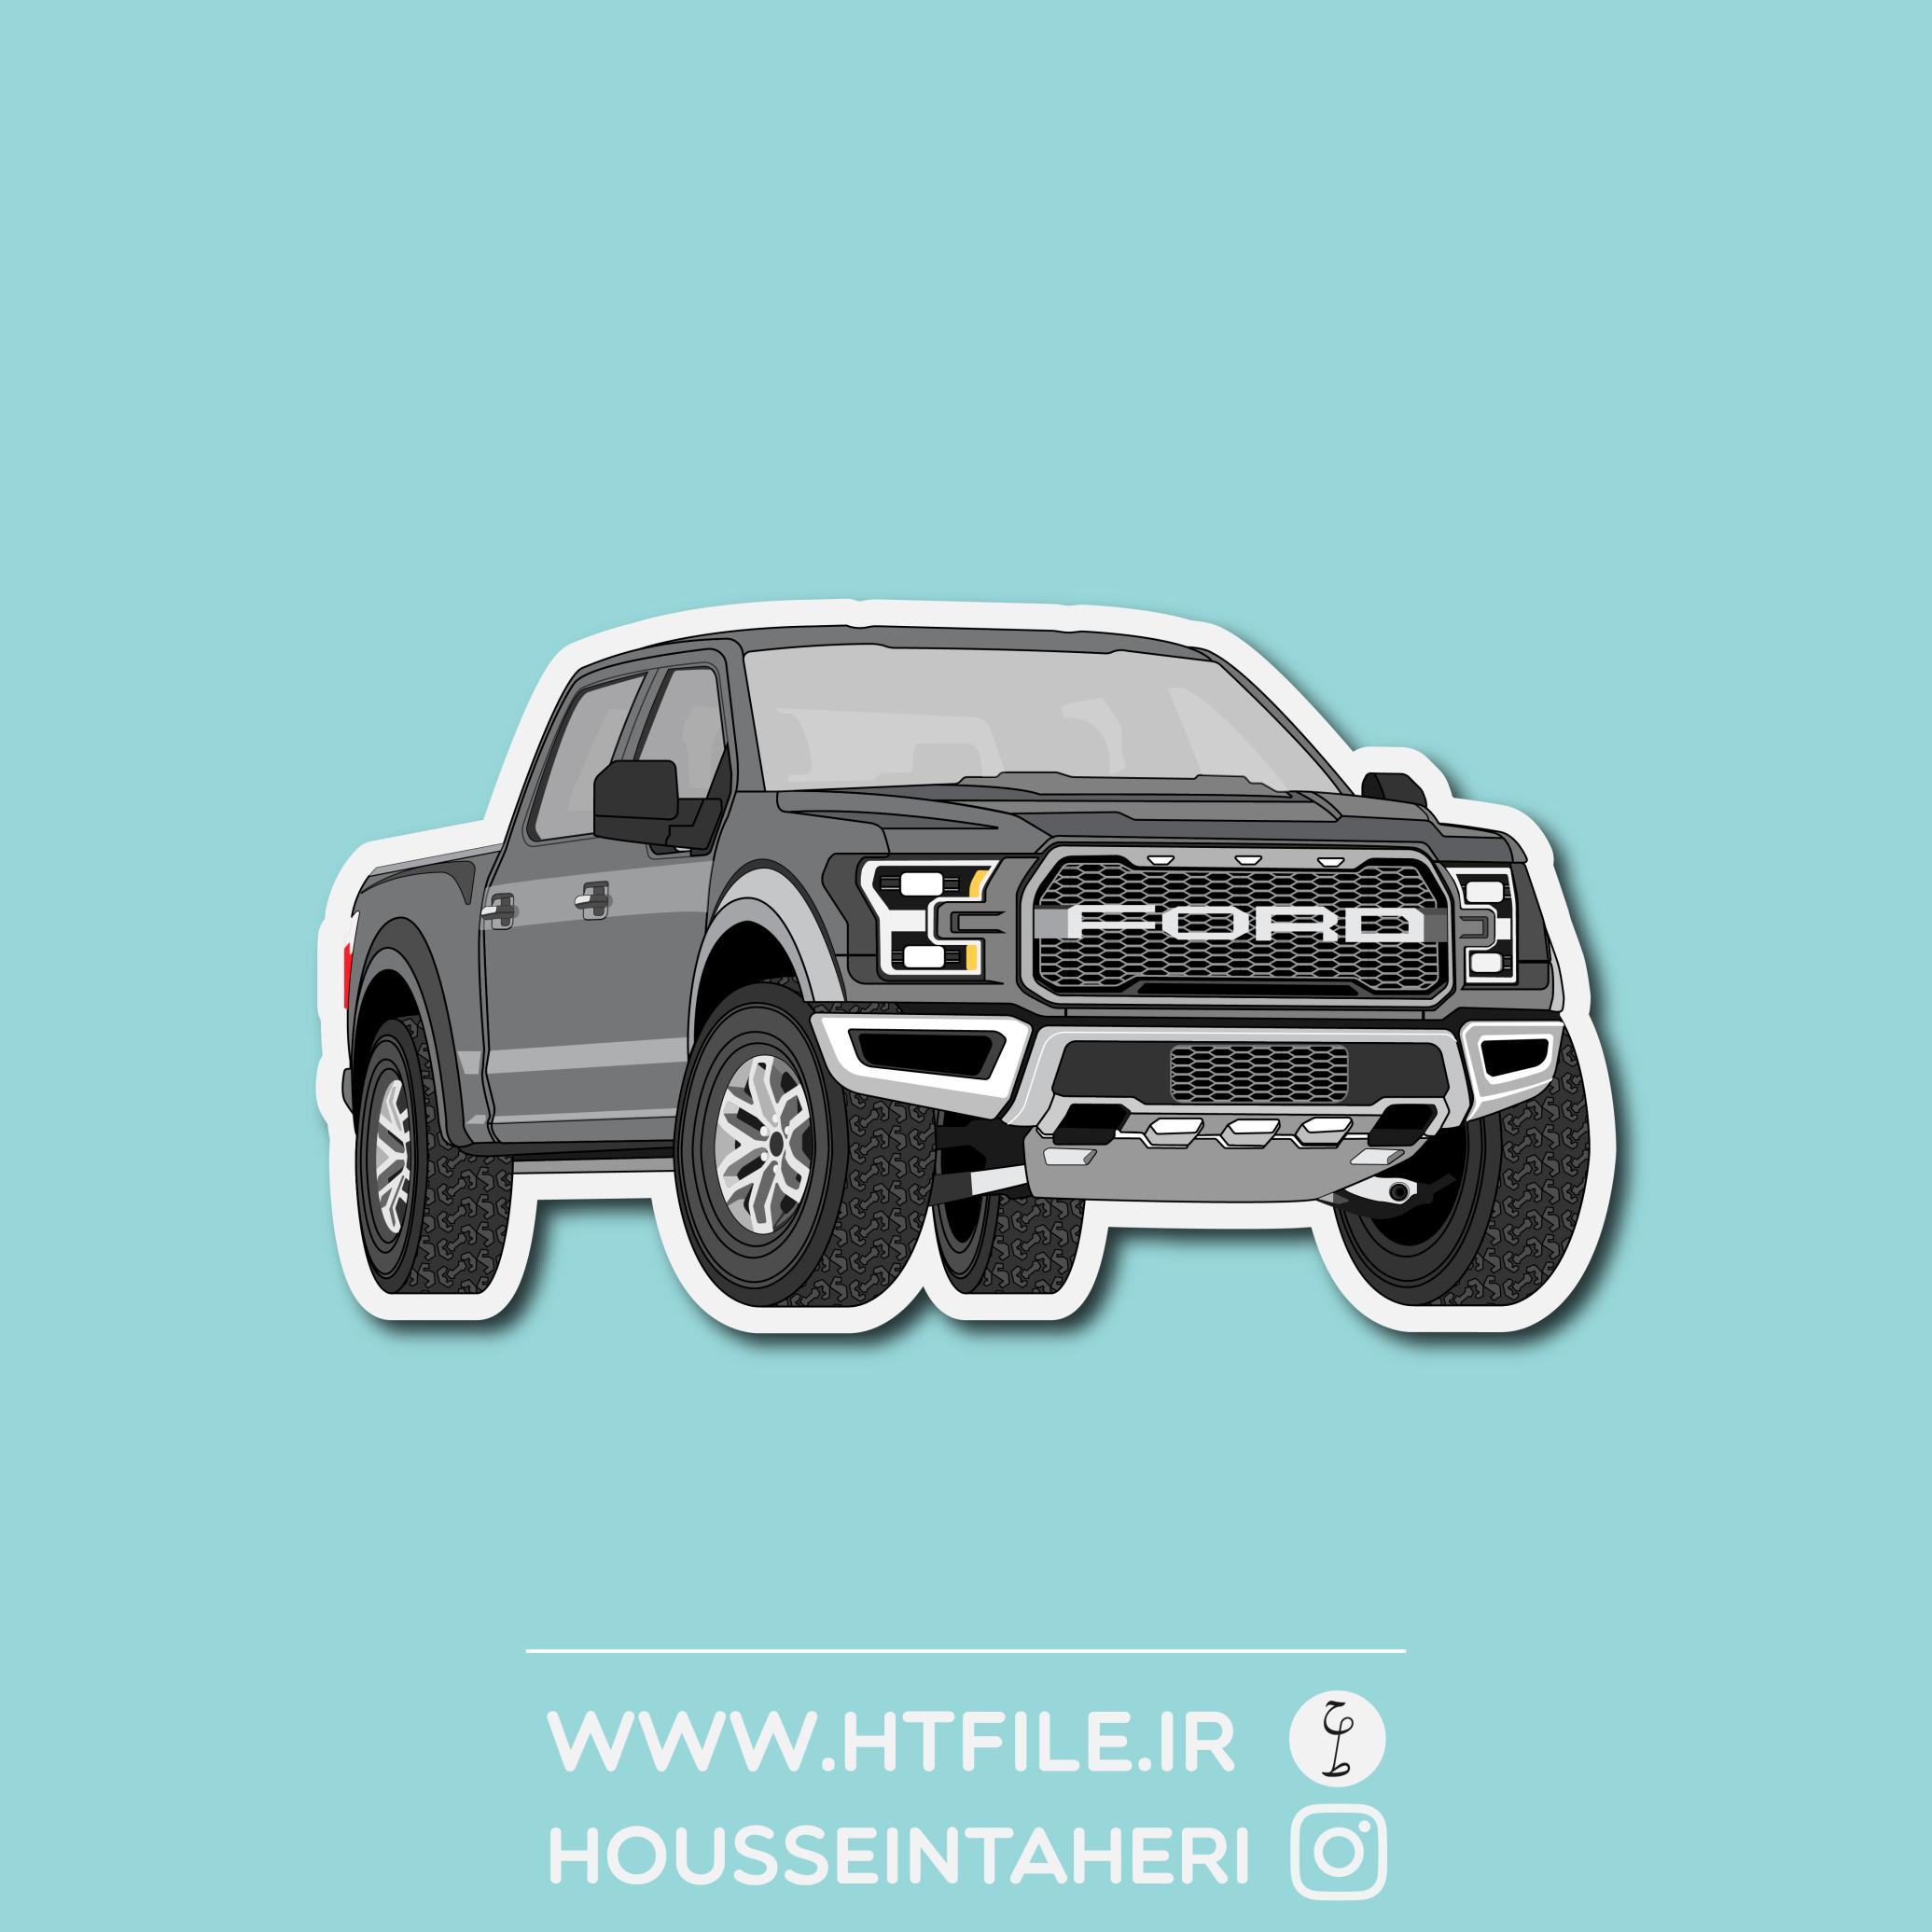 ماشین فورد Ford F 150 Raptor Off Road Trucks Www Htfile Ir In 2020 Offroad Trucks Ford F150 Offroad